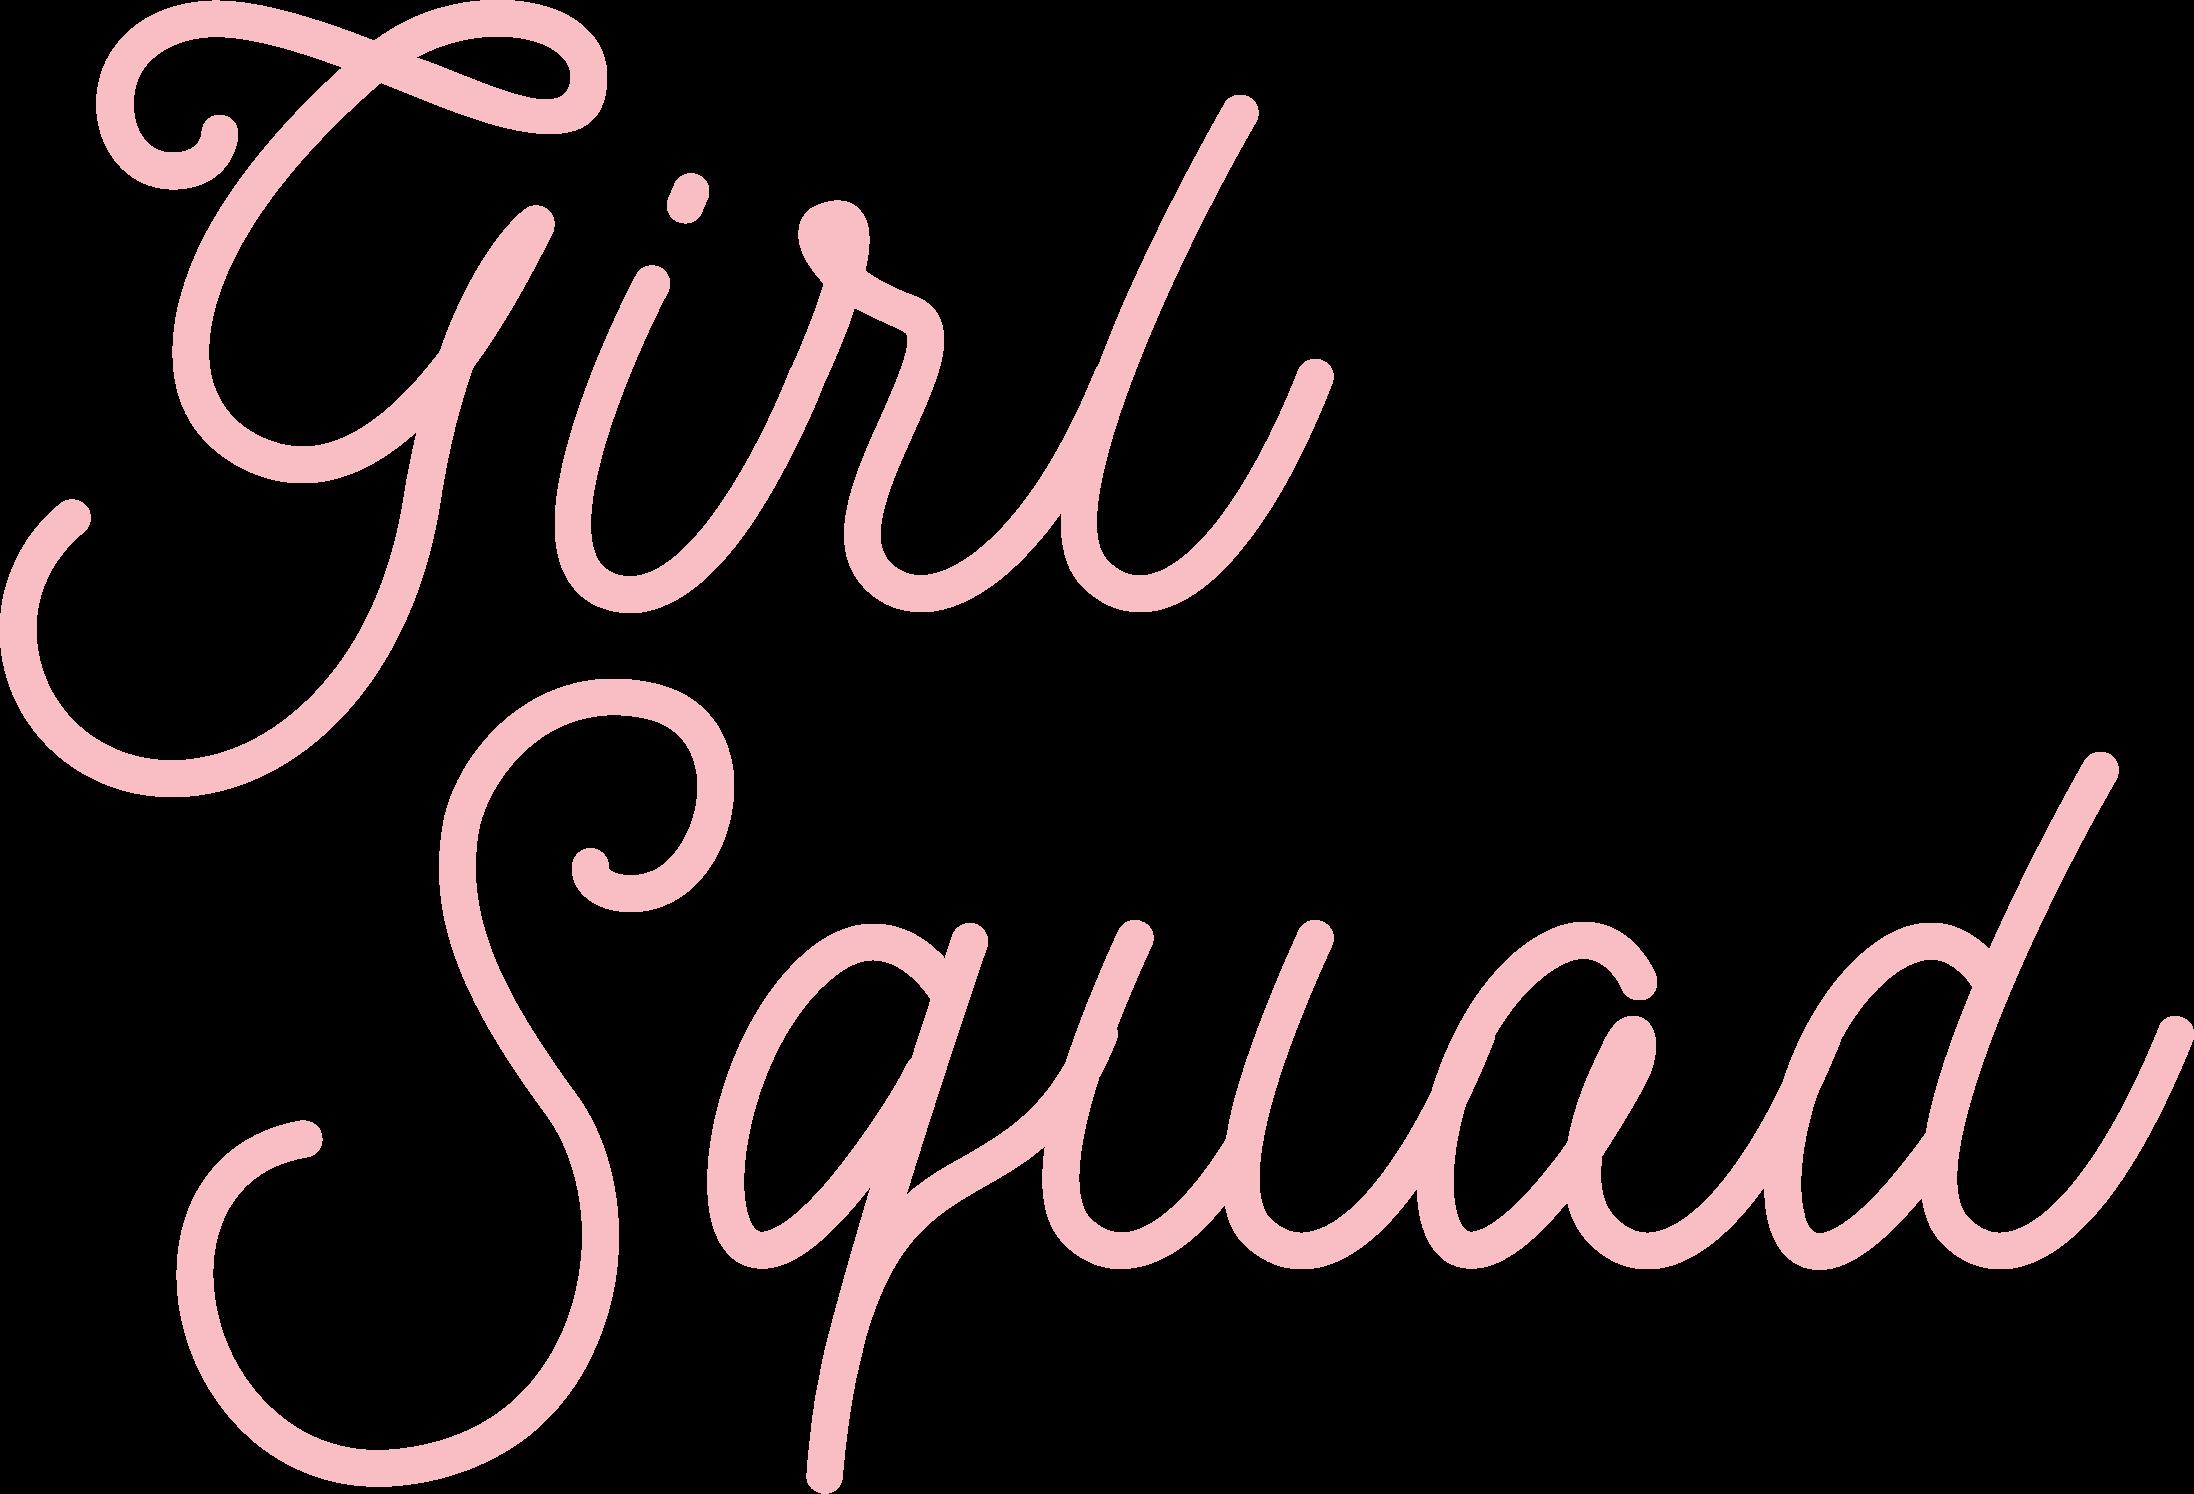 Girl Squad SVG Cut File